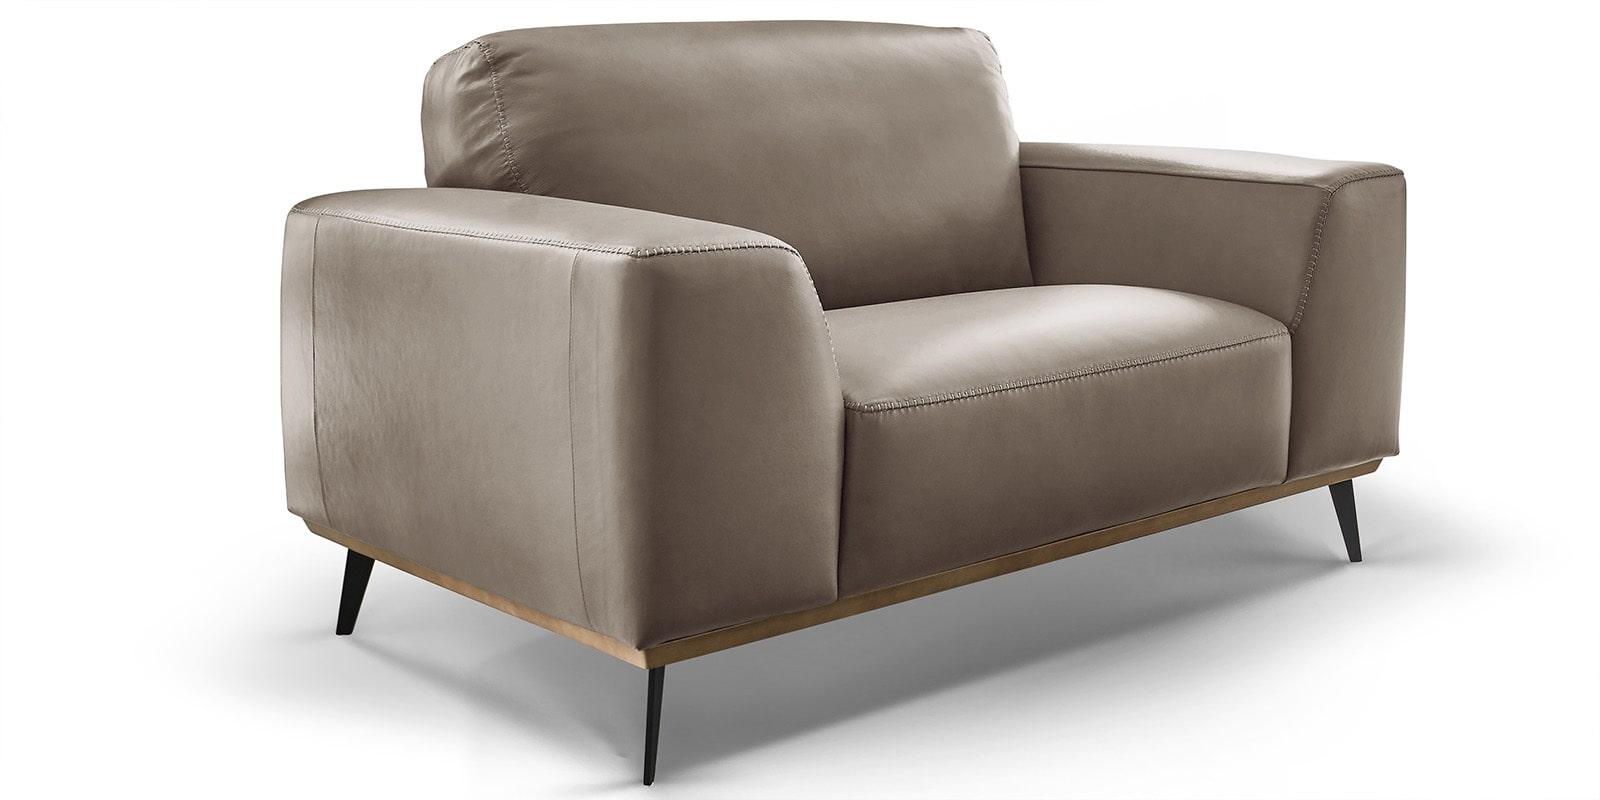 Moebella24 - 1,5-Sitzer - Sessel - Sofa - Barcelona - Leder - Taupe - Skandinavisches - Design - Punto - cavallo - Nähte - Elegante - Füße - Detailaufnahme